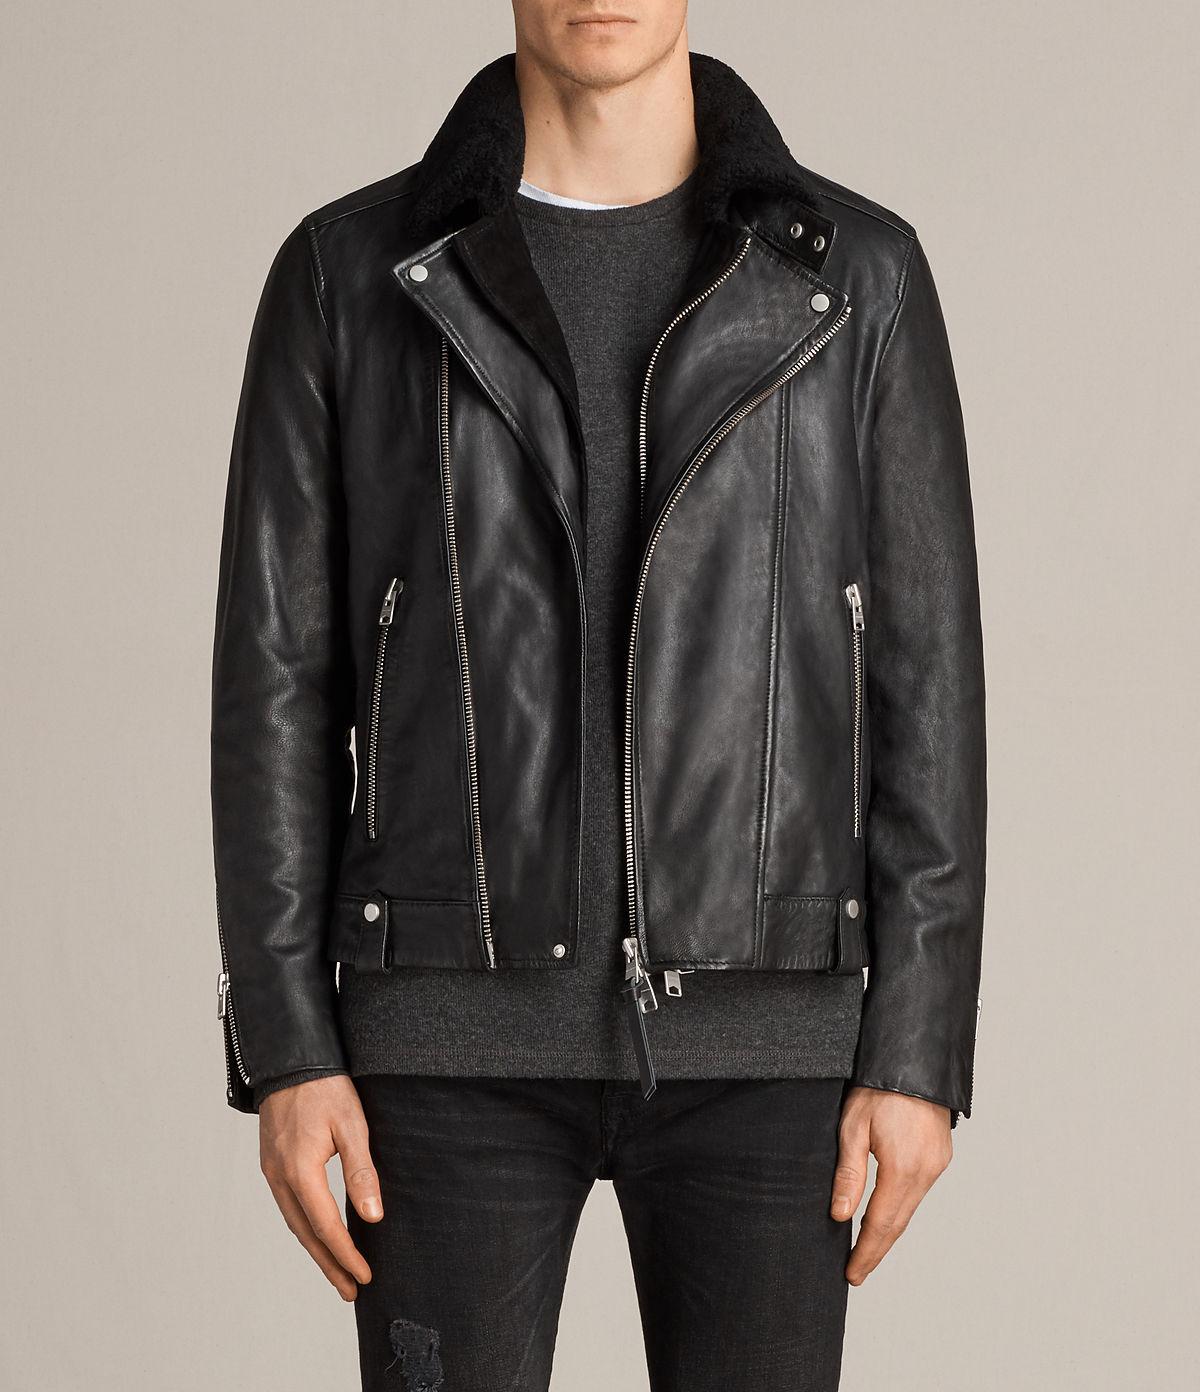 prospect-leather-biker-jacket